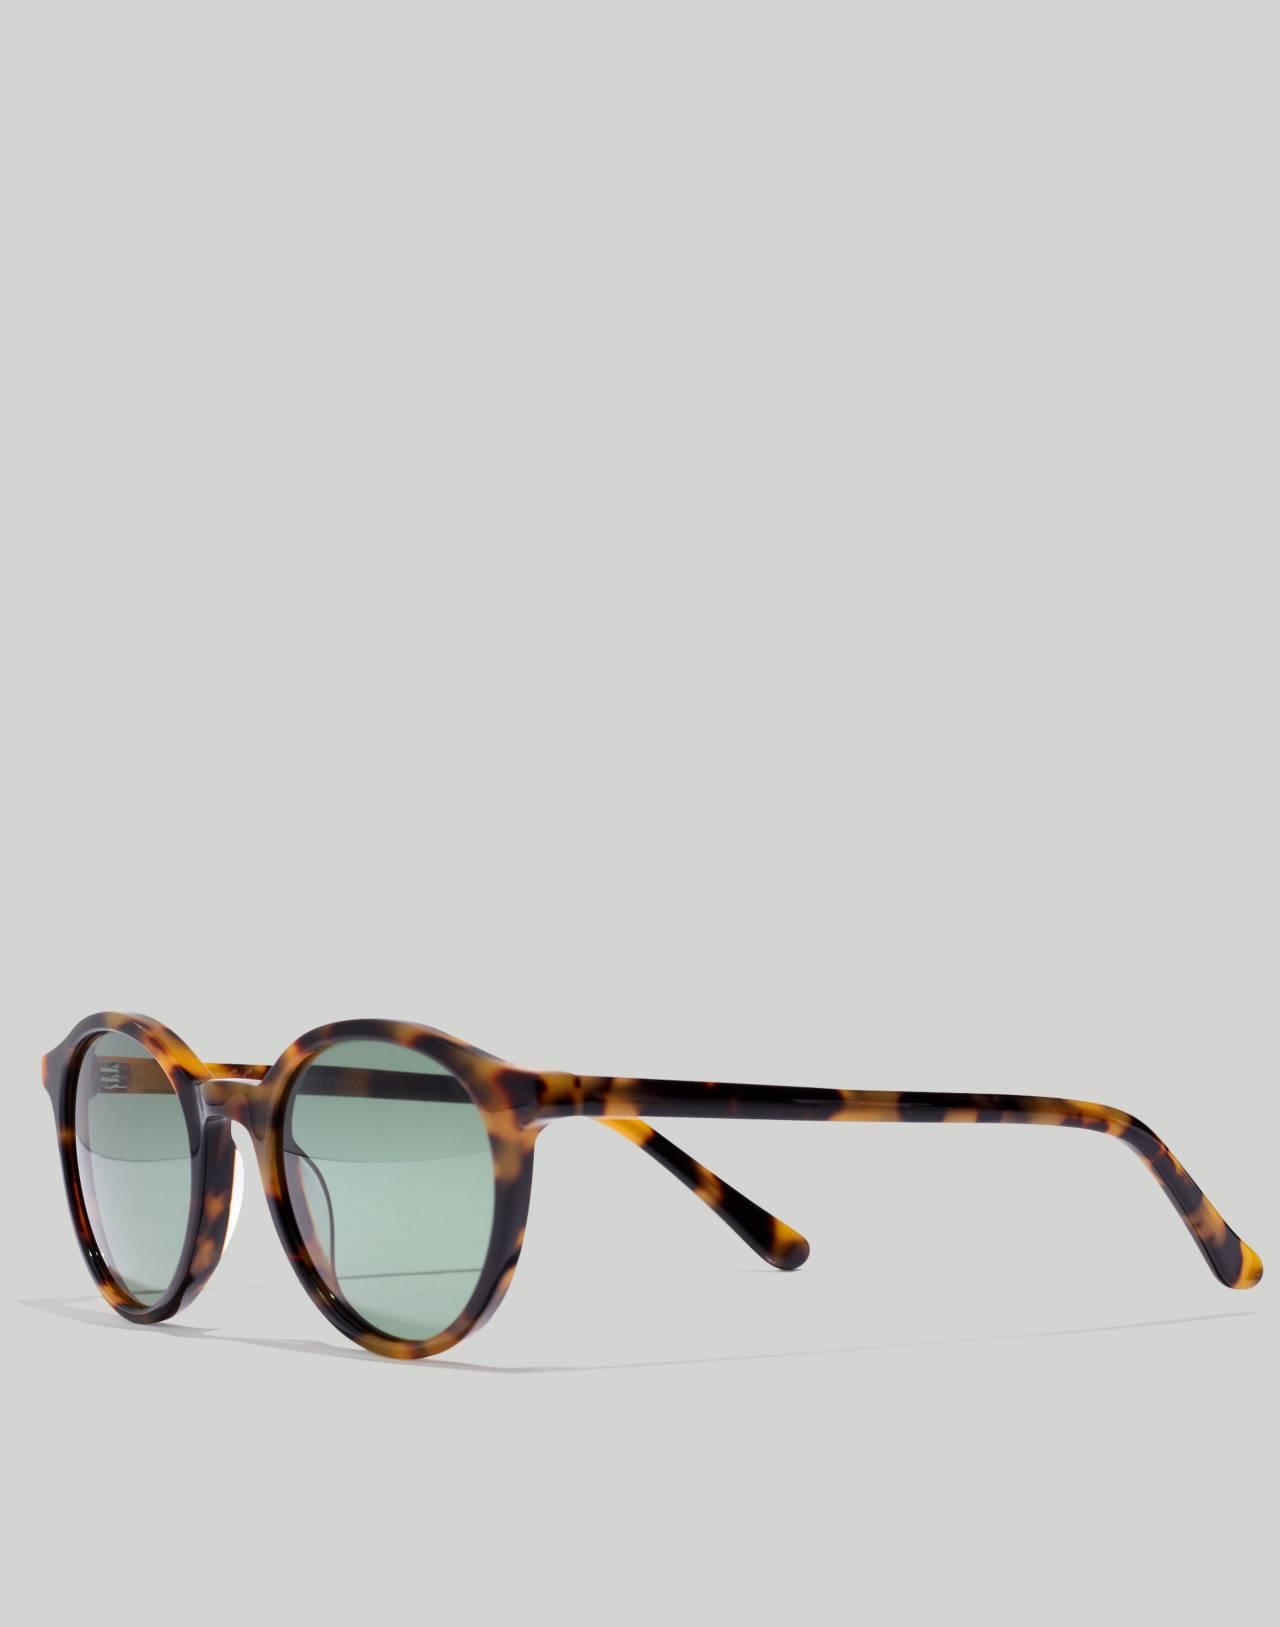 Layton Sunglasses in demi tort image 2